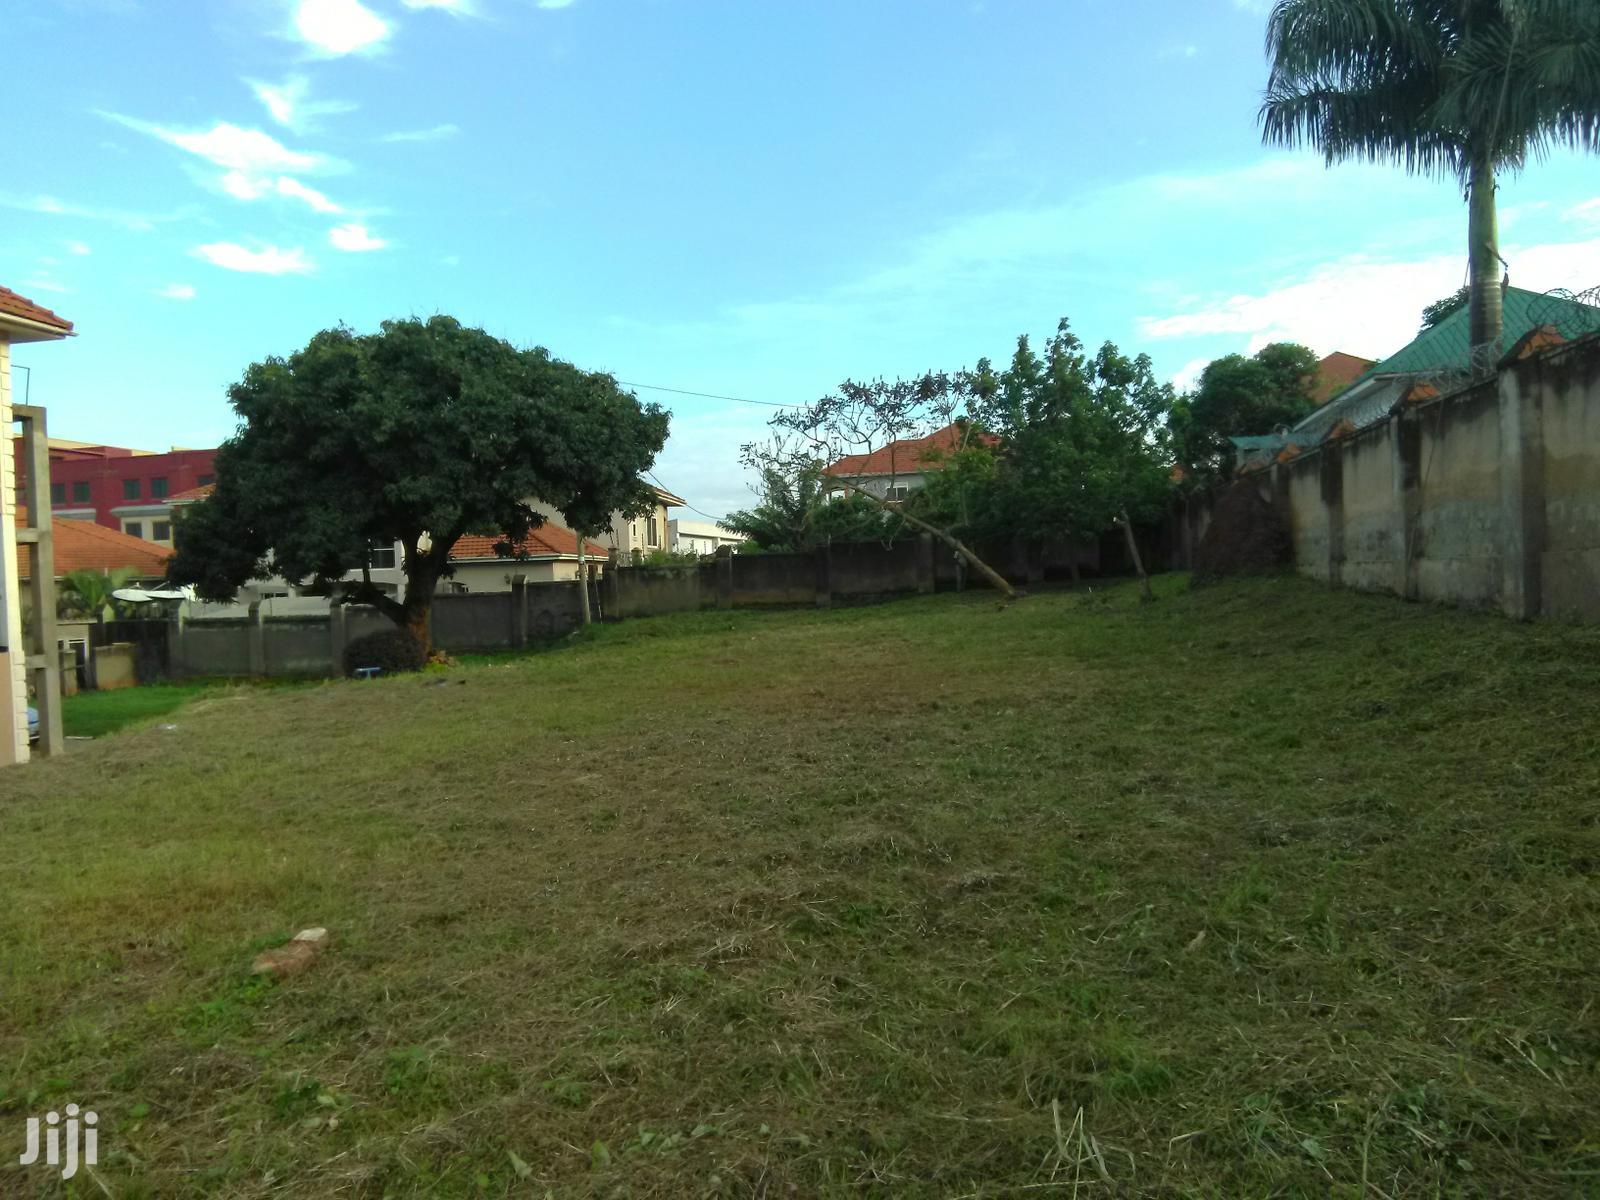 Hot 25 Decimals Land In Buziga For Sale | Land & Plots For Sale for sale in Kampala, Central Region, Uganda